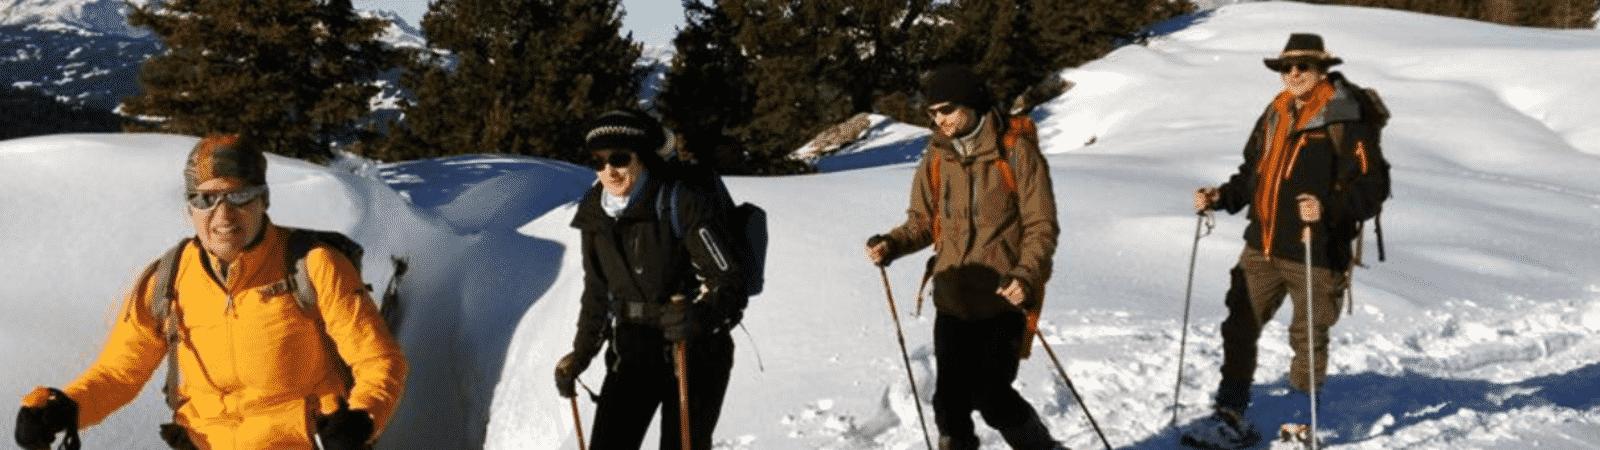 6-day Mont Blanc snowshoeing tour